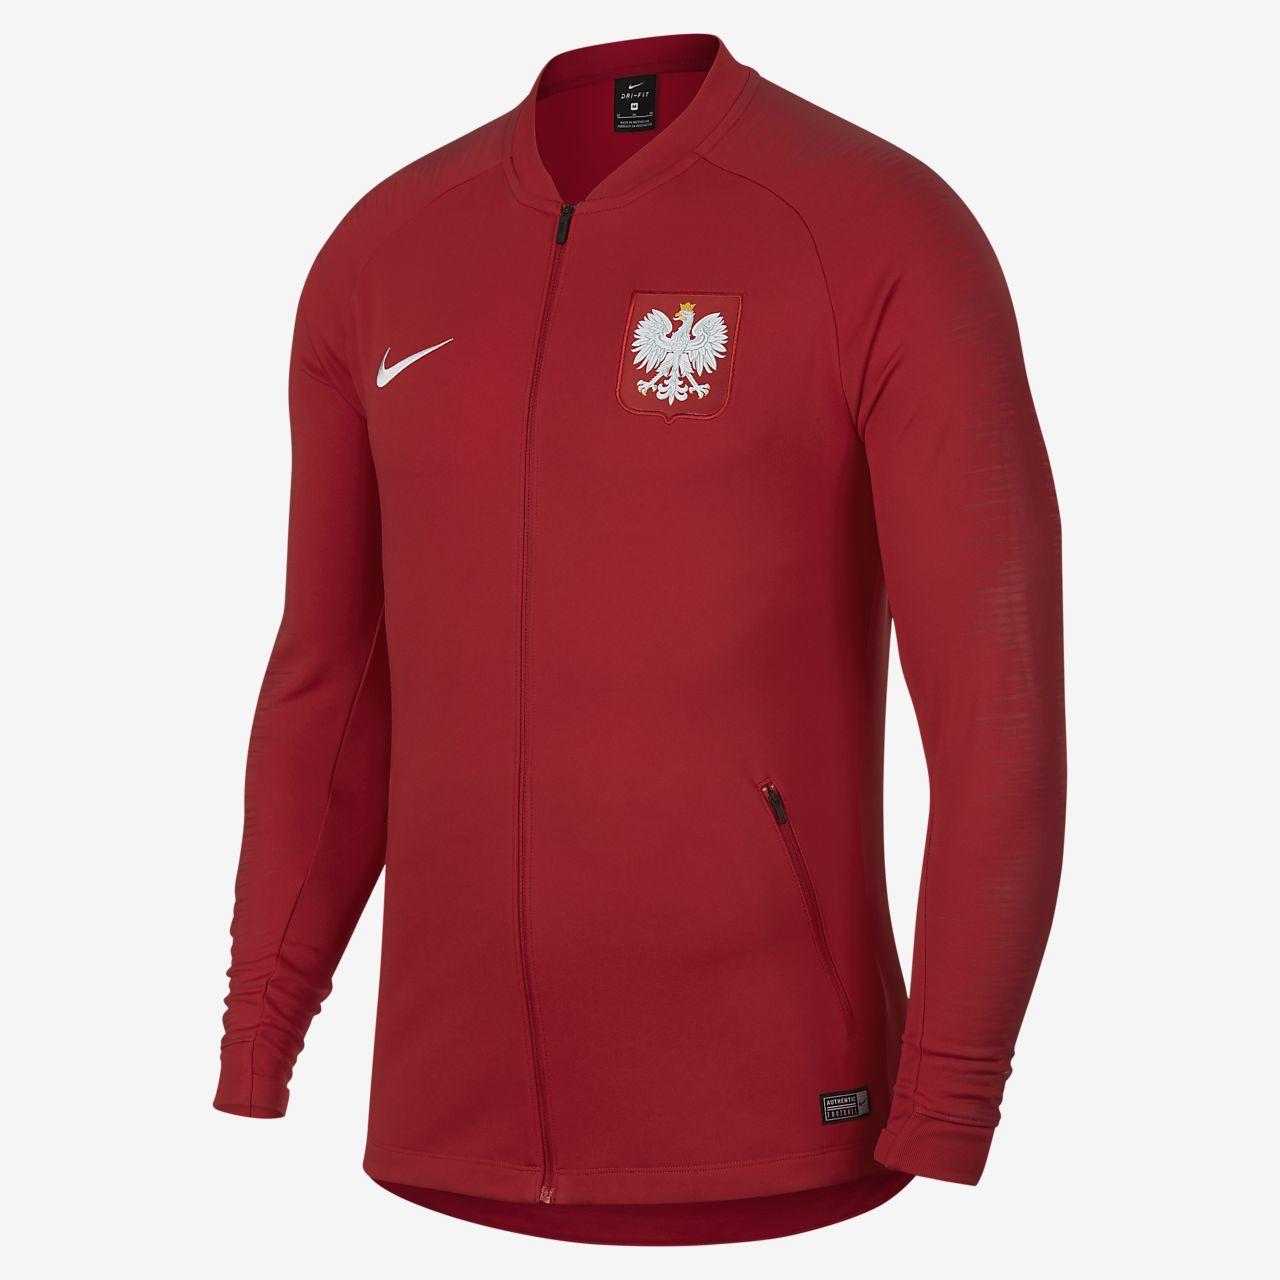 b693d7002350 Low Resolution Ανδρικό ποδοσφαιρικό τζάκετ Poland Anthem Ανδρικό  ποδοσφαιρικό τζάκετ Poland Anthem